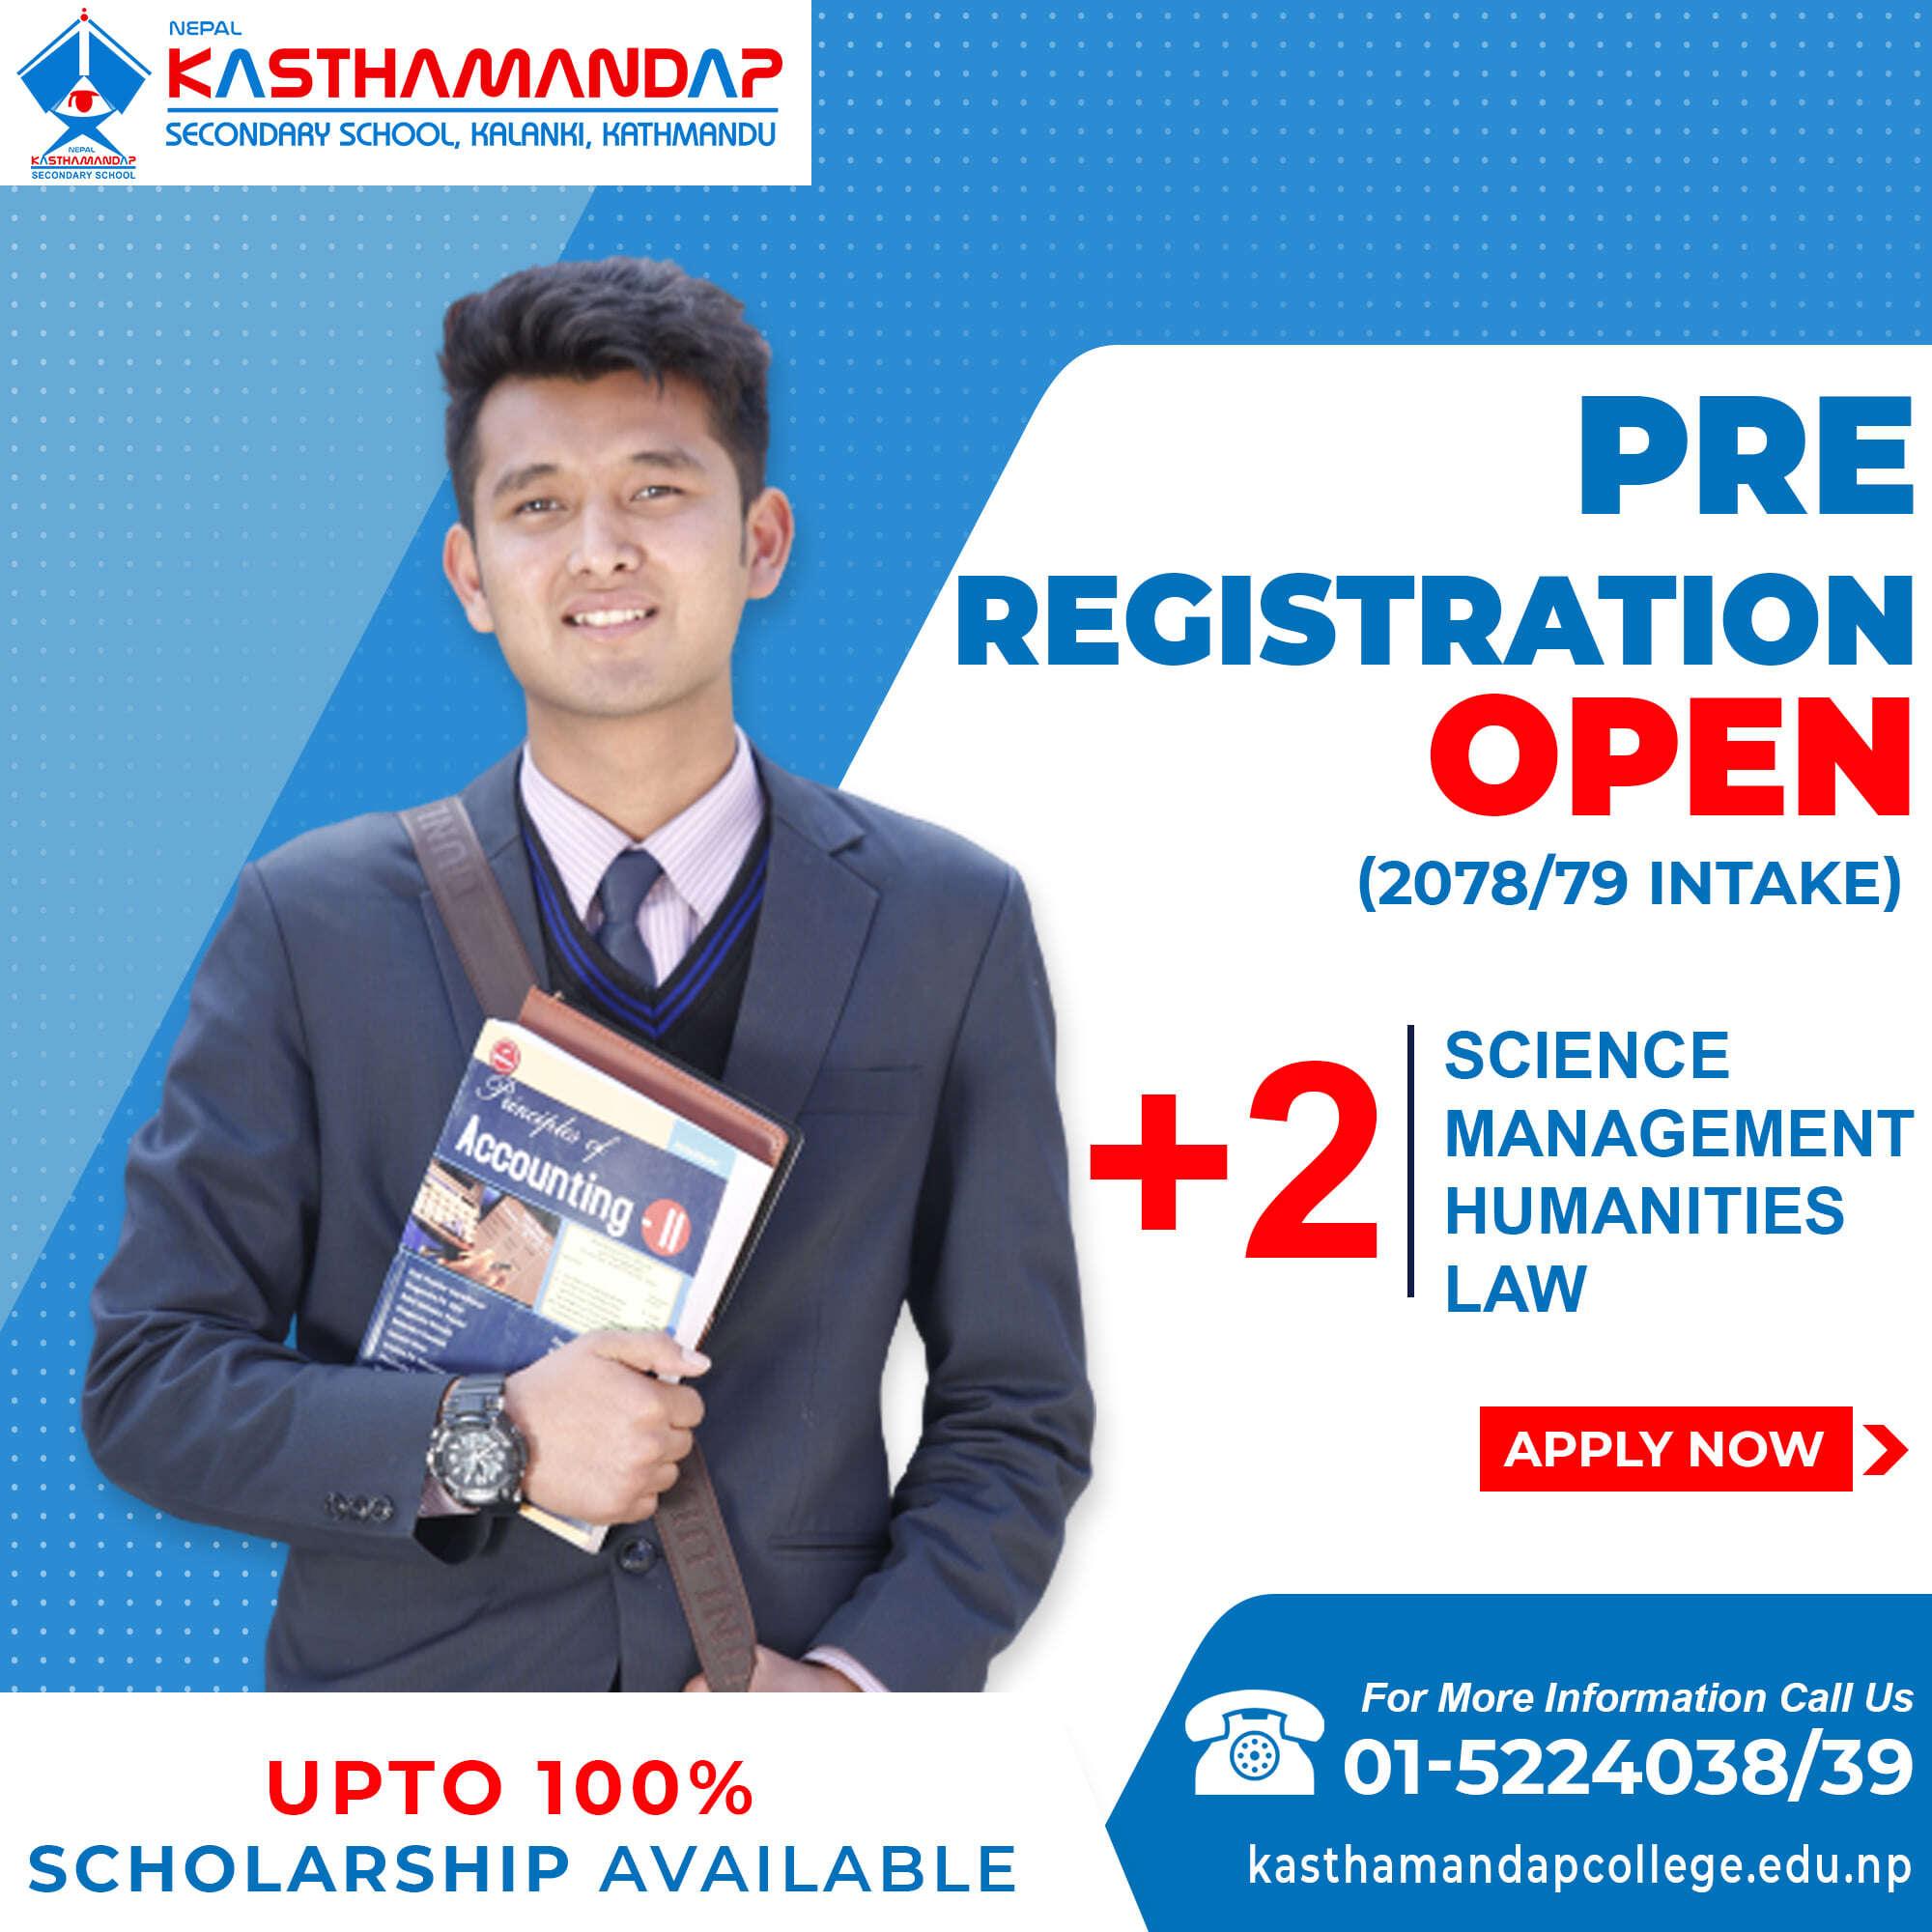 Nepal Kasthamandap College